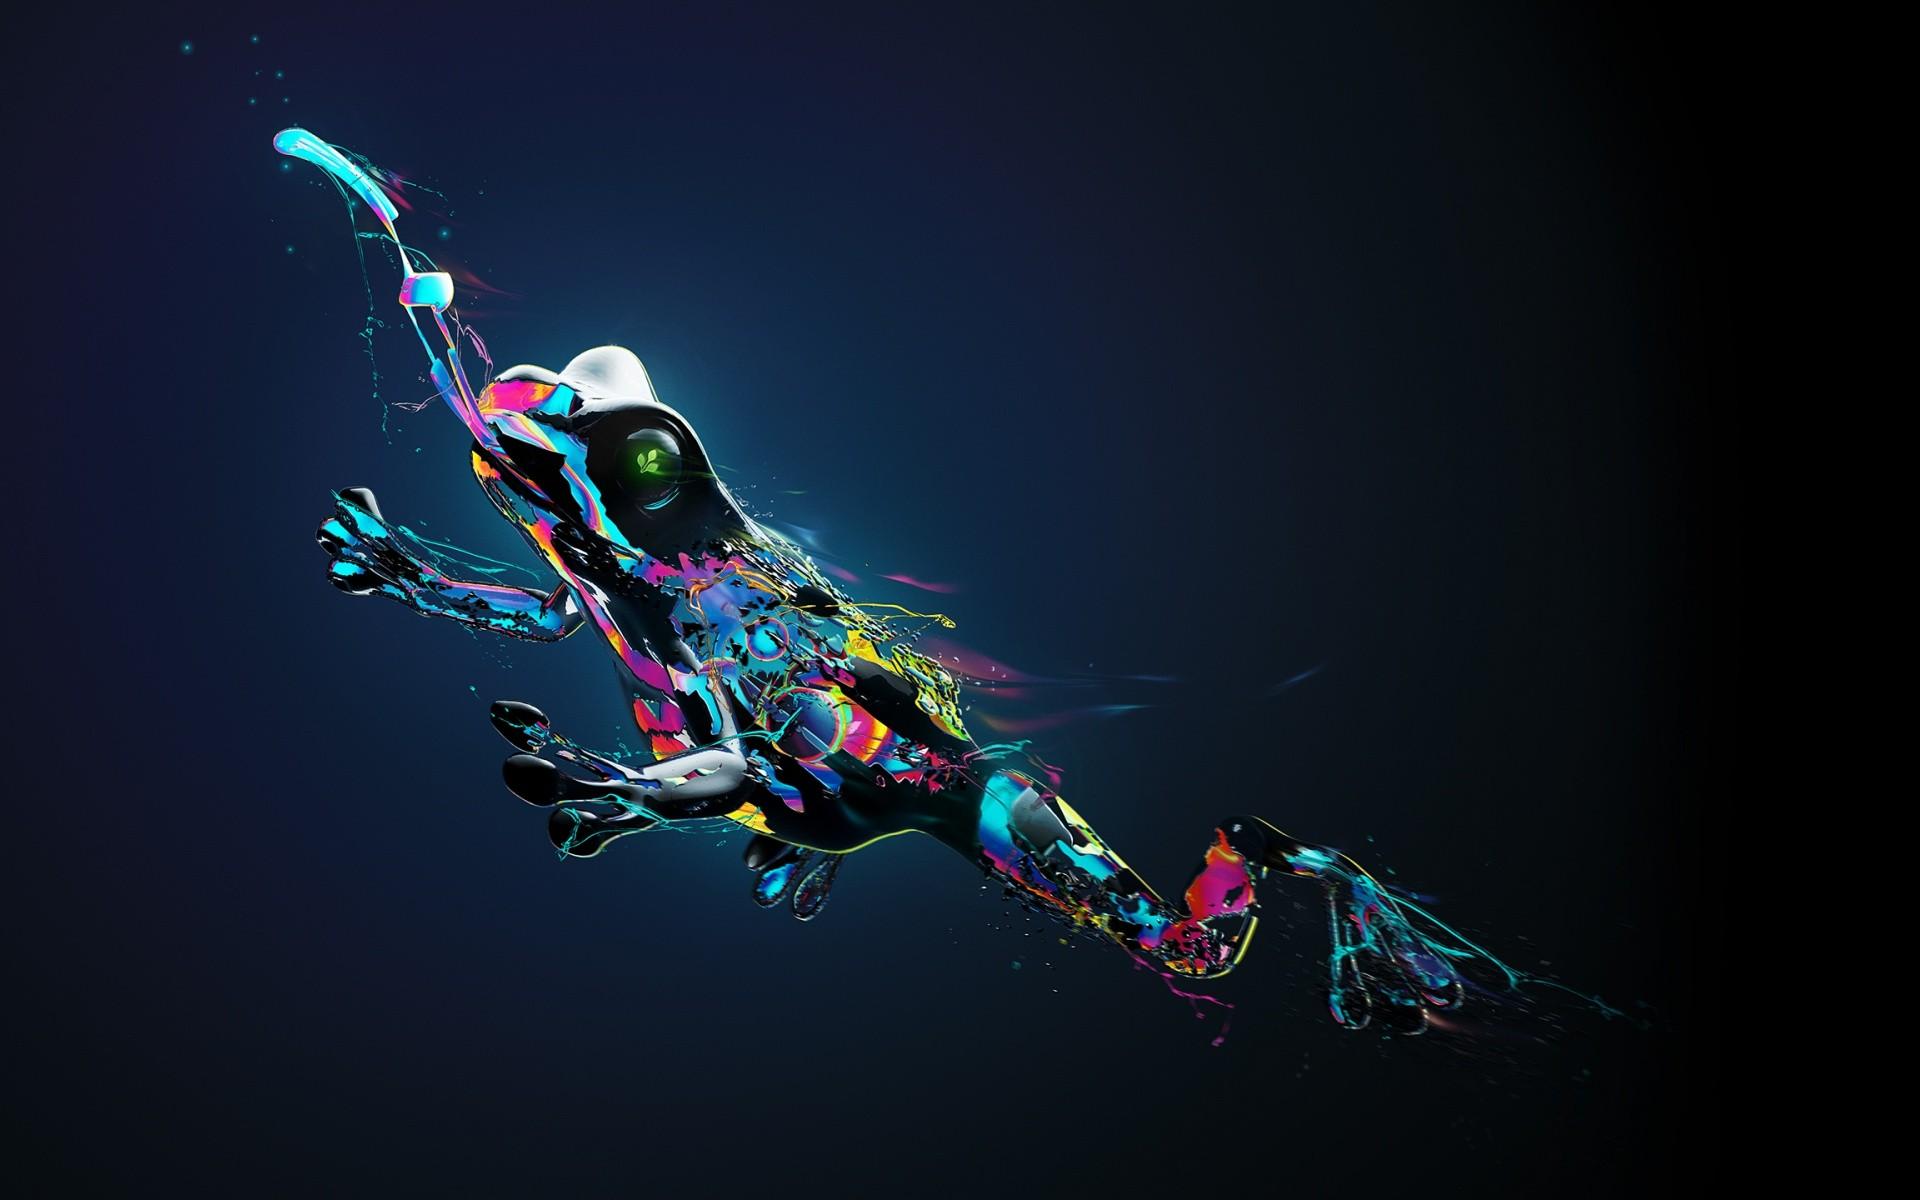 Dmt Wallpaper Hd Frog Fantasy Art Hd Artist 4k Wallpapers Images